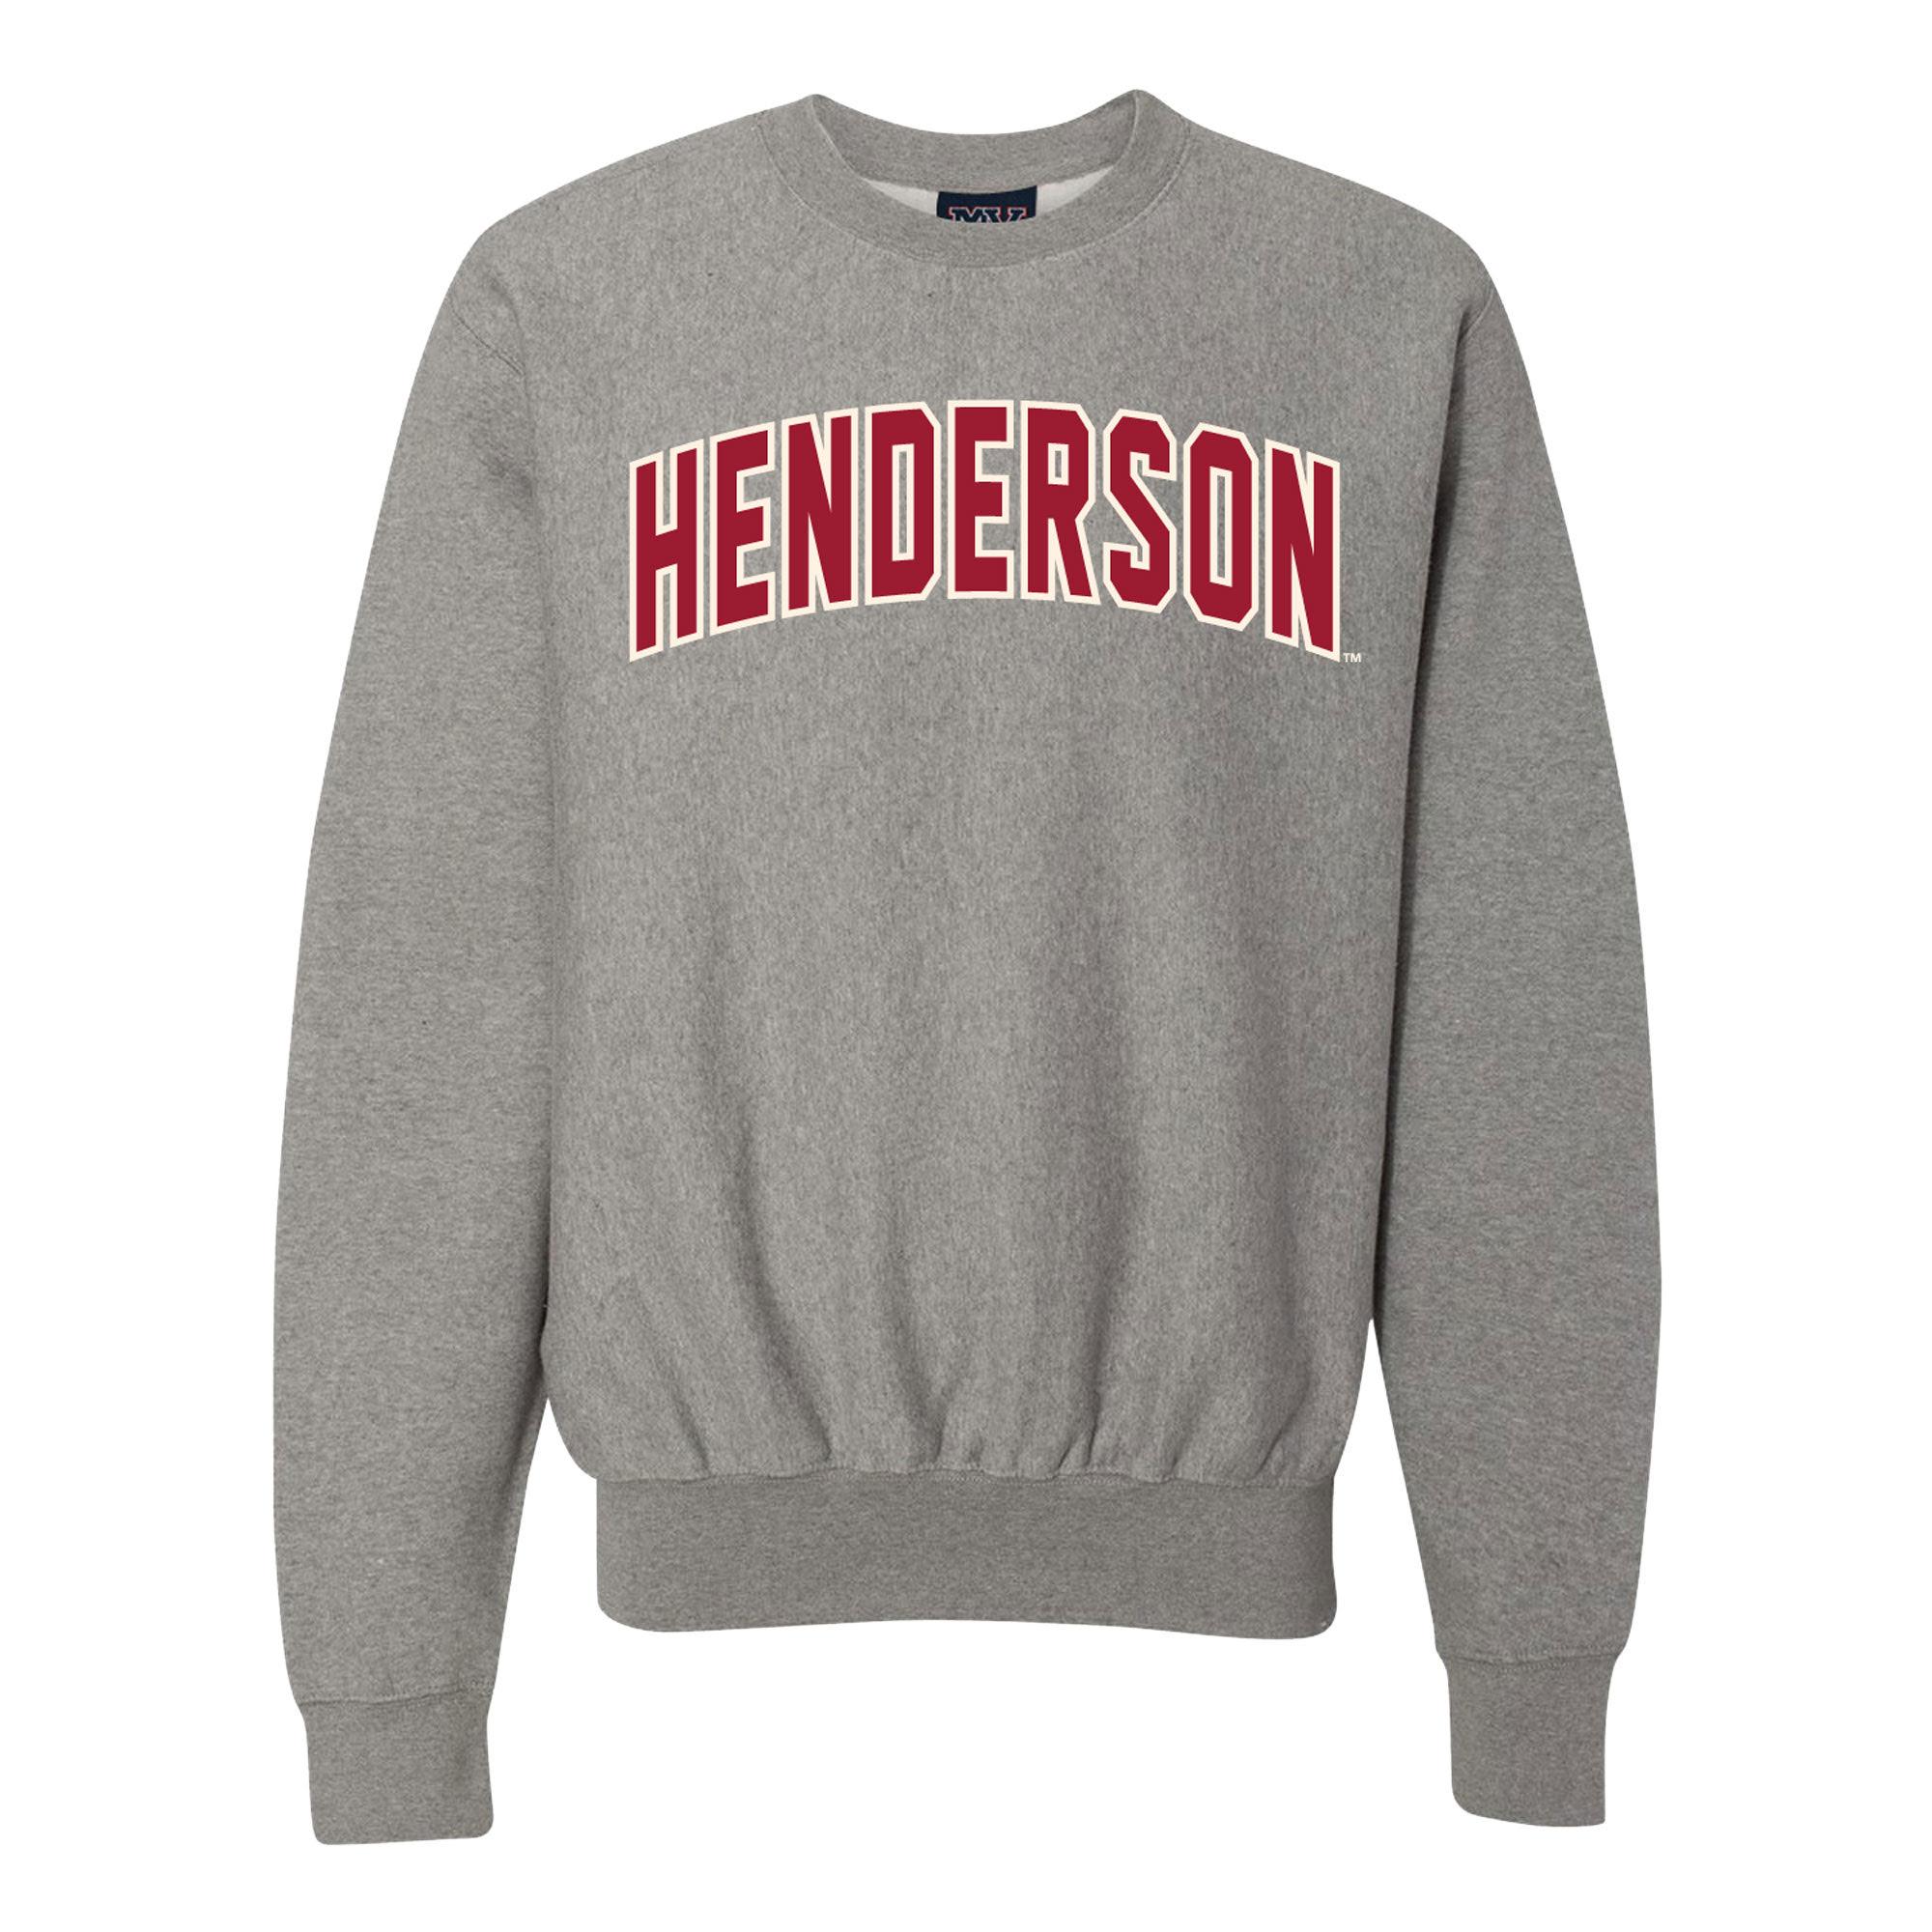 Henderson Proweave Crewneck